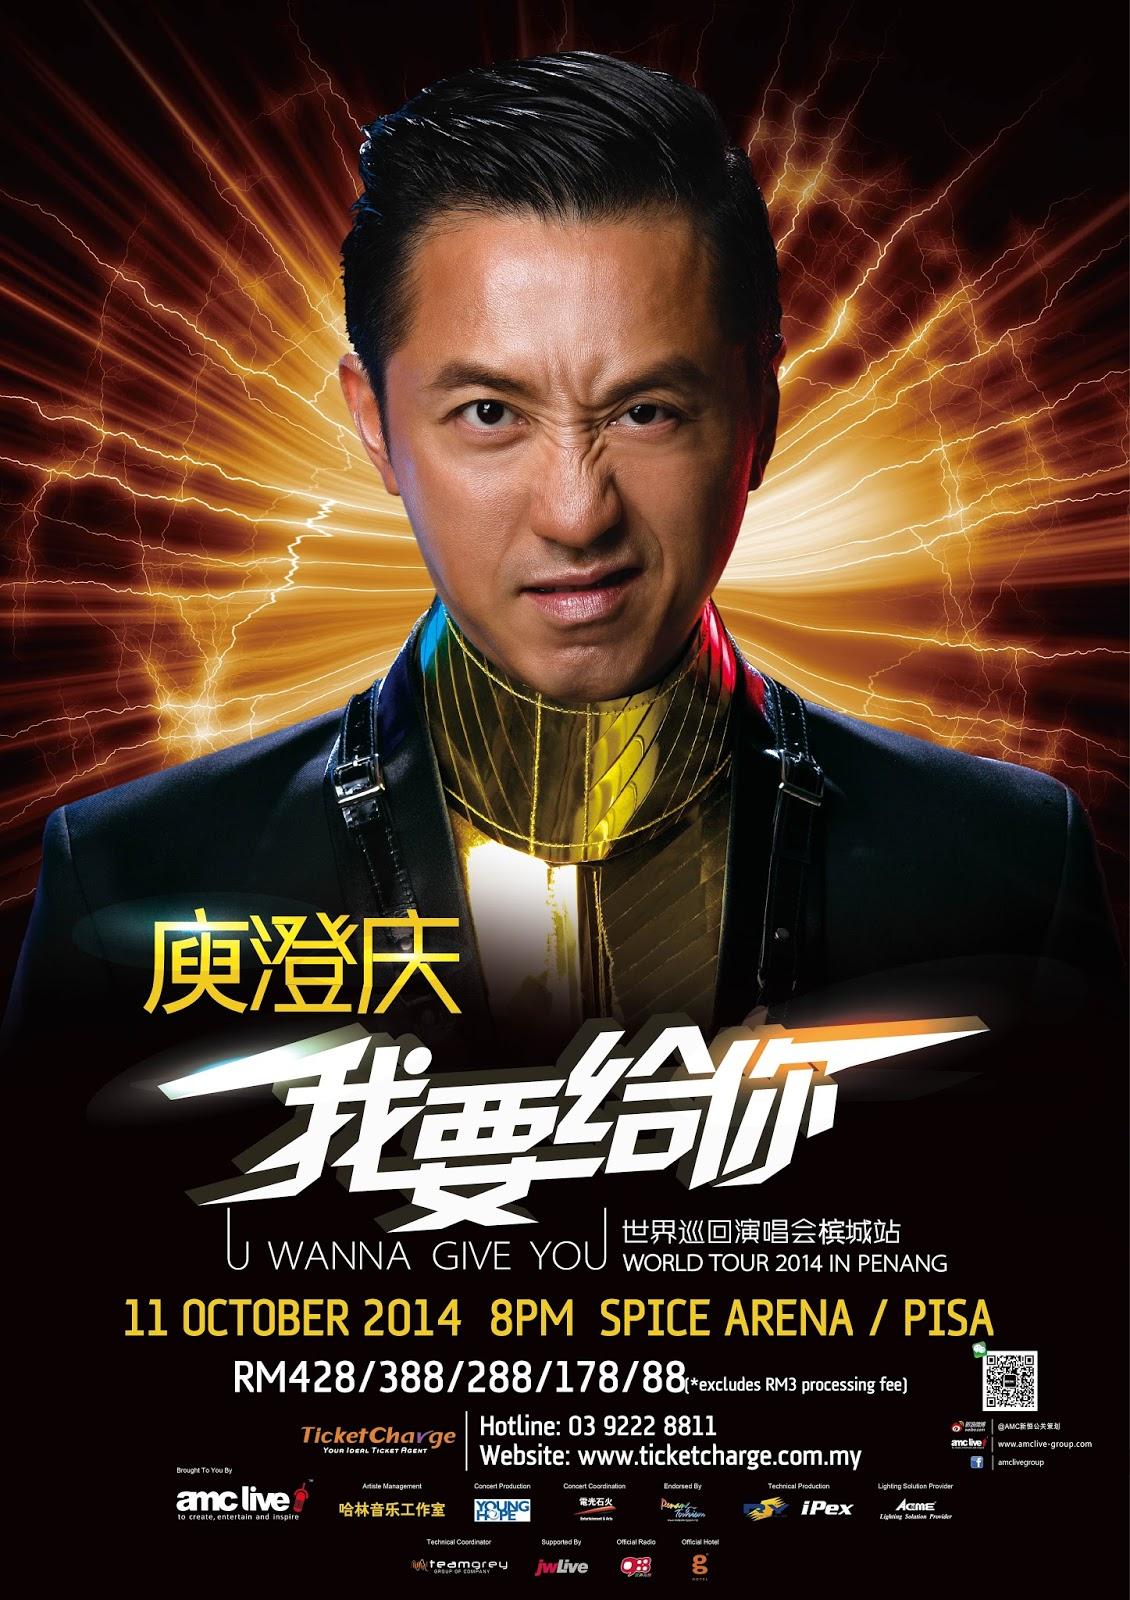 庾澄庆 2014 我要给你世界巡回演唱会 - 槟城站 Harlem Yu I Wanna Give You World Tour 2014 in Penang